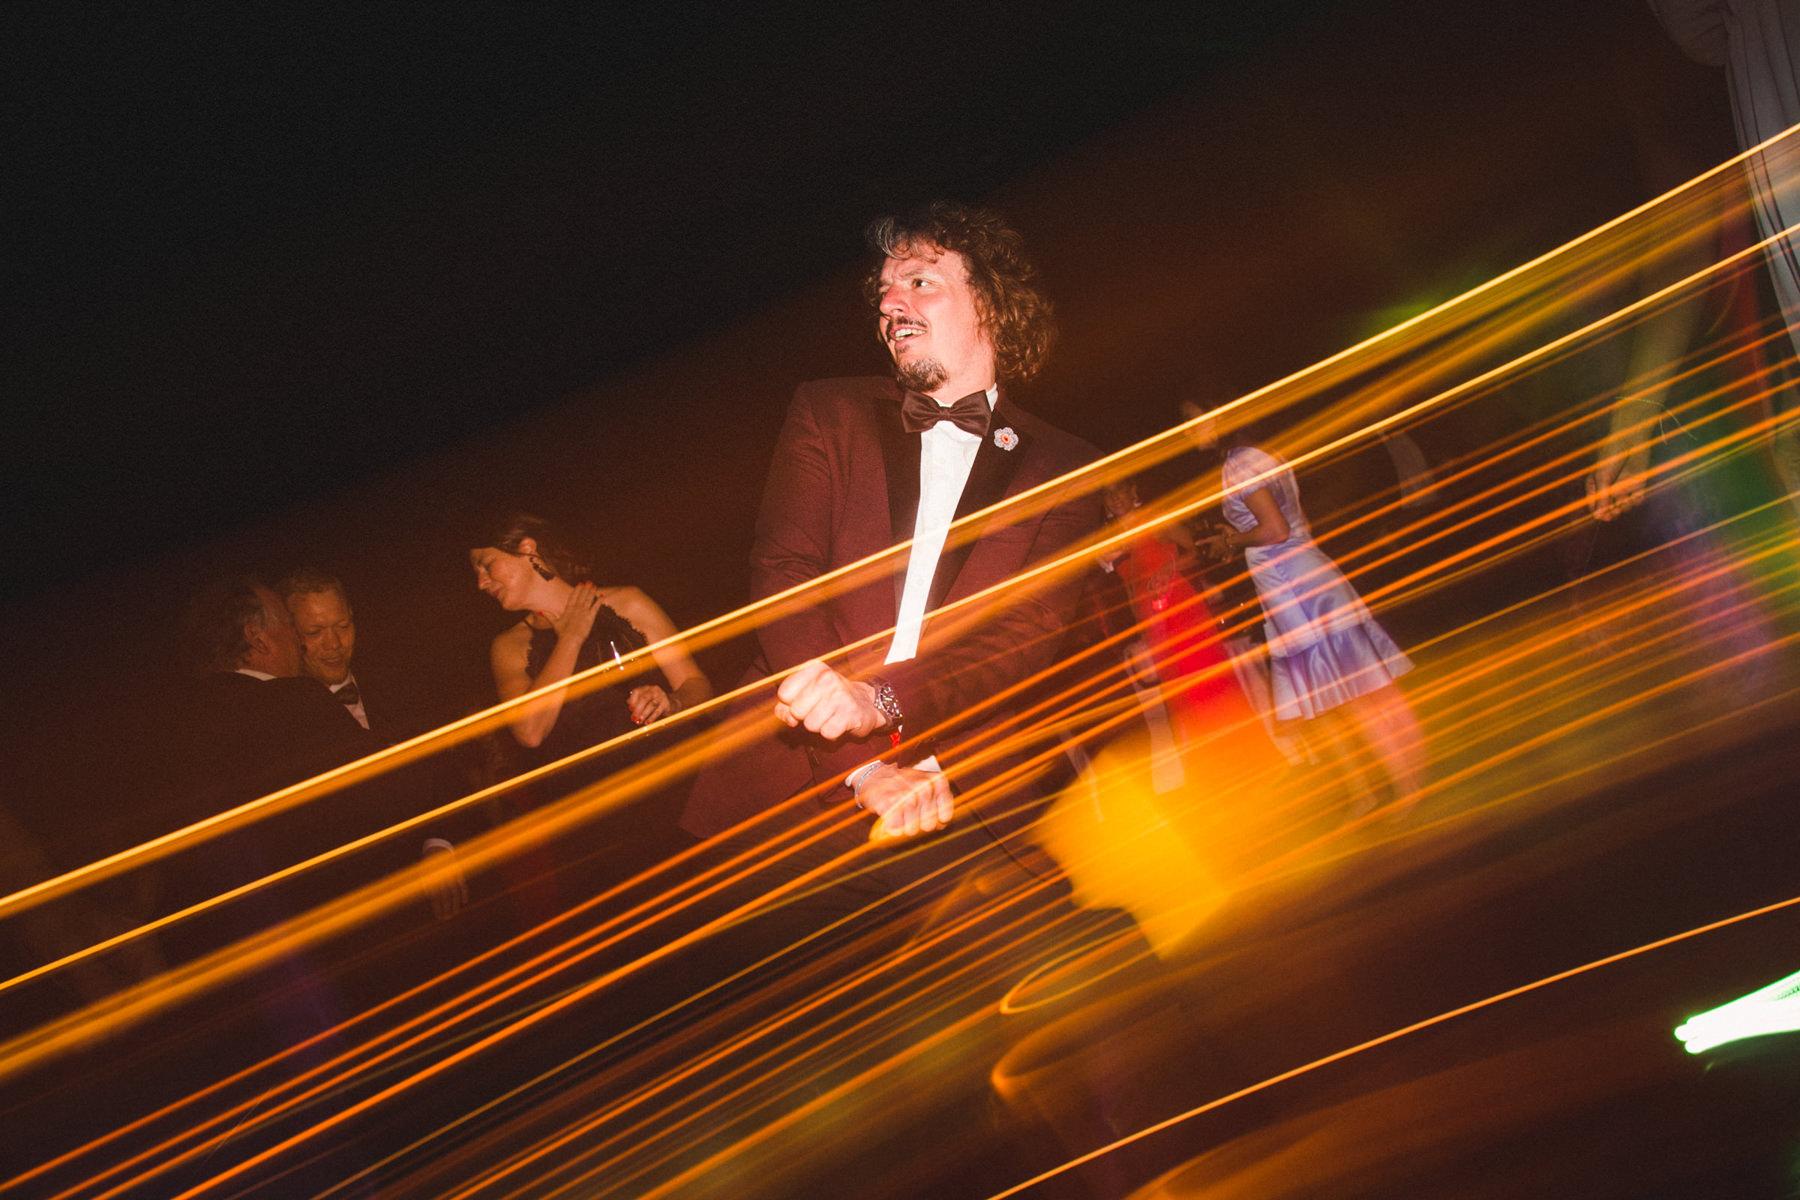 Wedding_Photography_Carlos_Hevia_Barcelona_Berlin_55.jpg